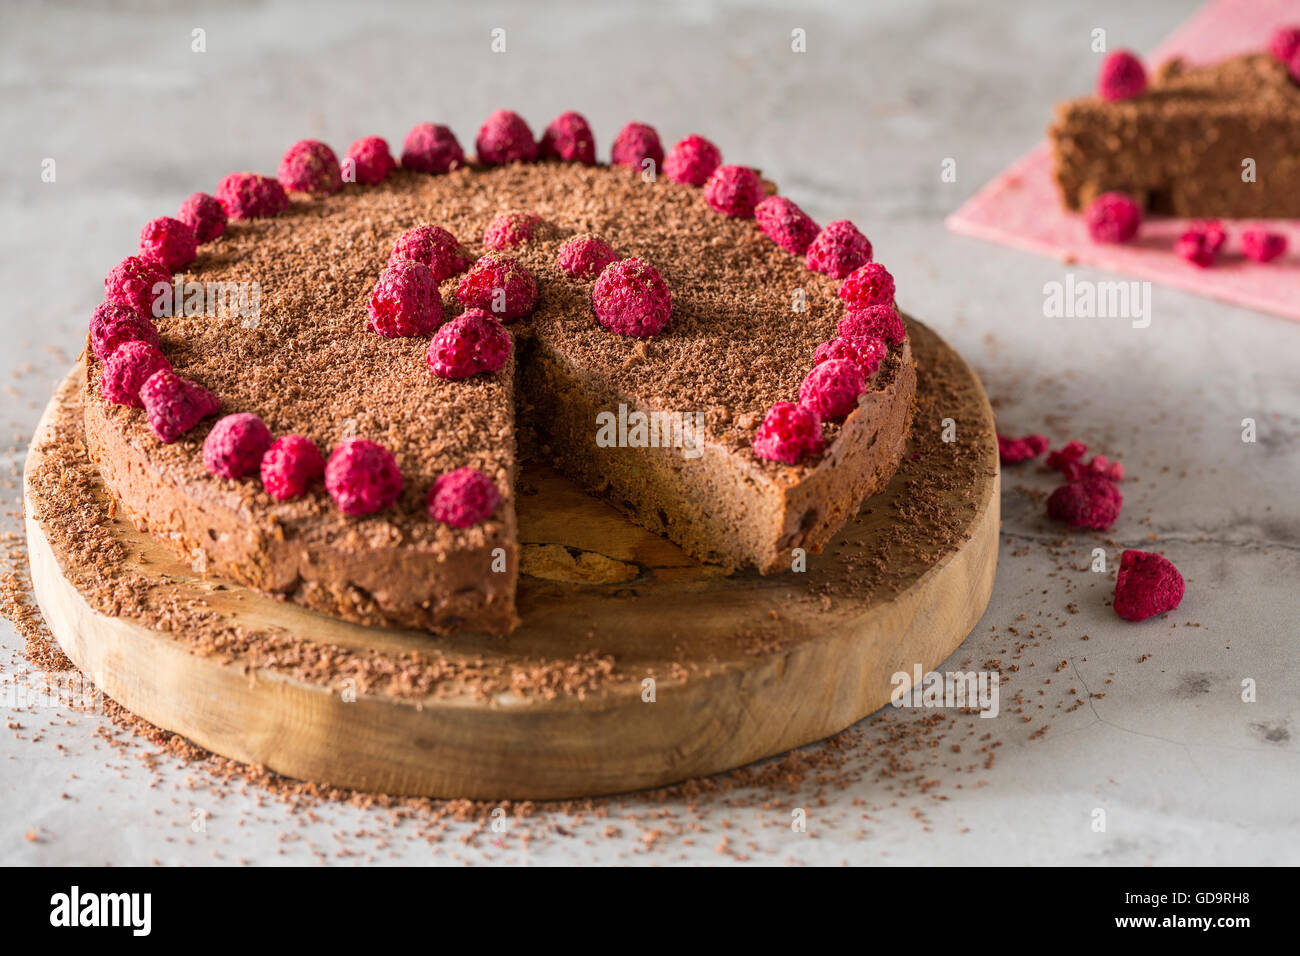 Schokoladen-Kuchen verziert mit Freeze getrocknete Himbeeren. Stockbild